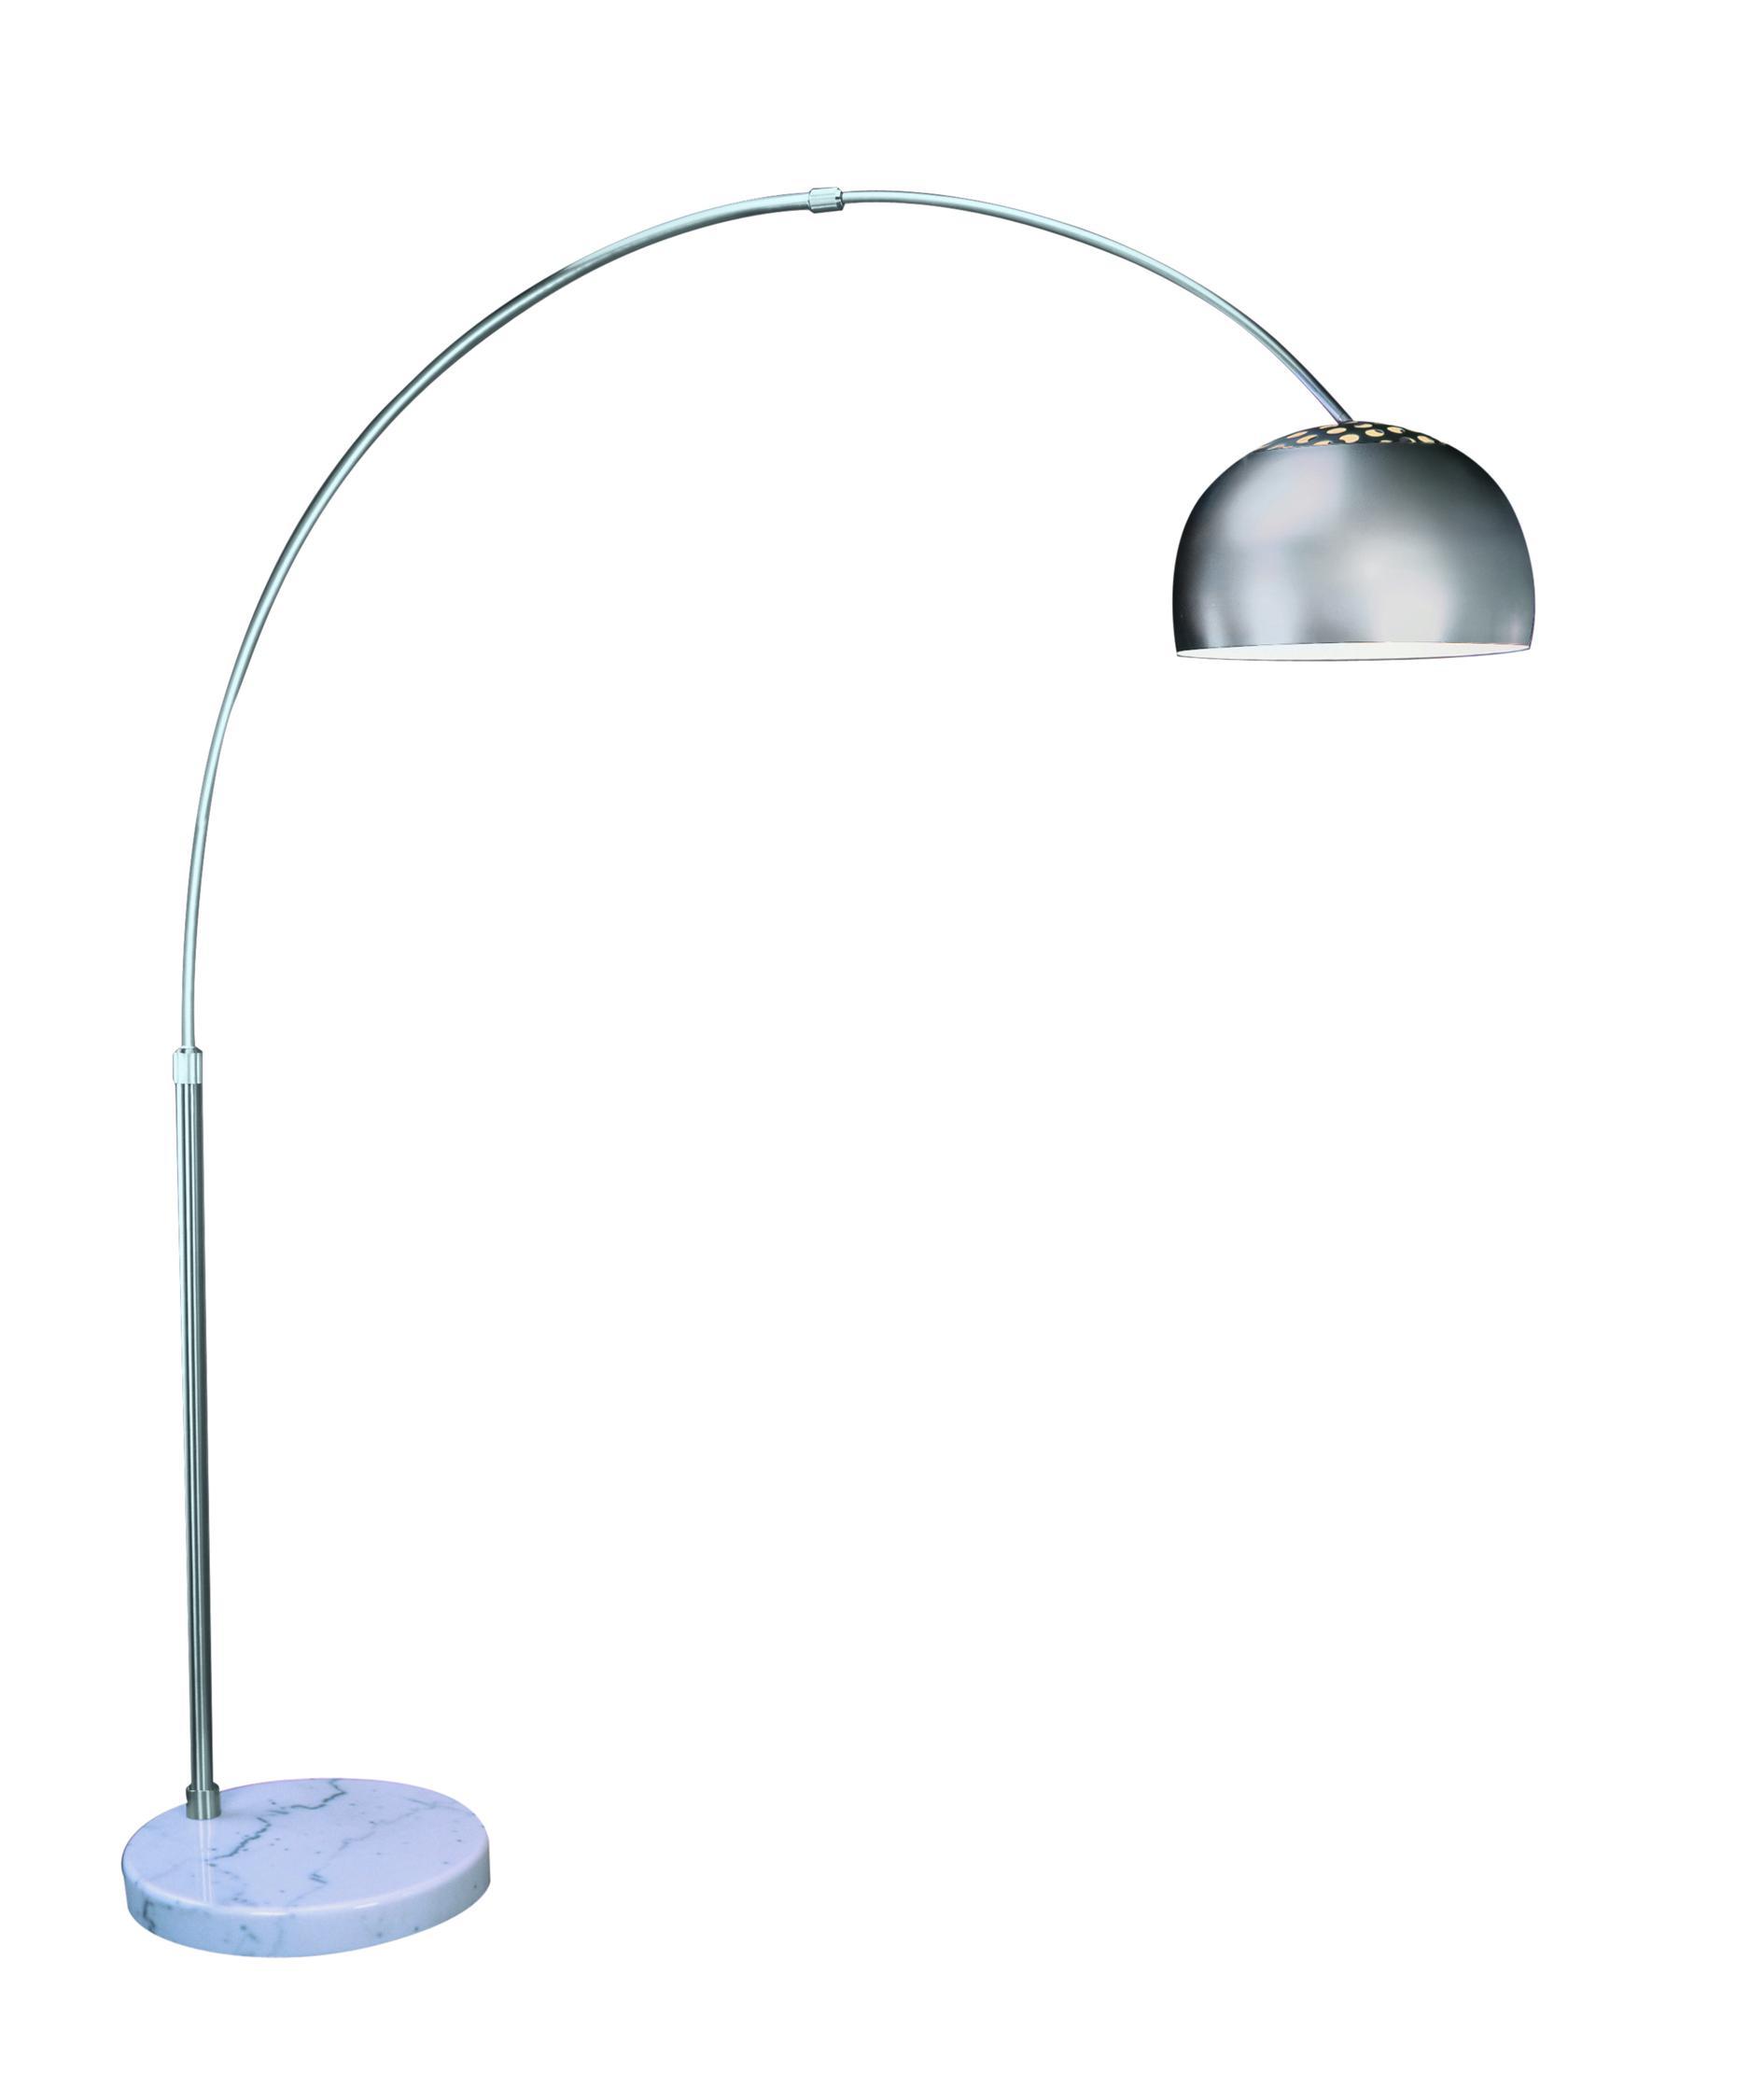 trend lighting tfa big arc  inch high arc lamp  capitol  - trend lighting tfa big arc  inch high arc lamp  capitol lightinglightingcom